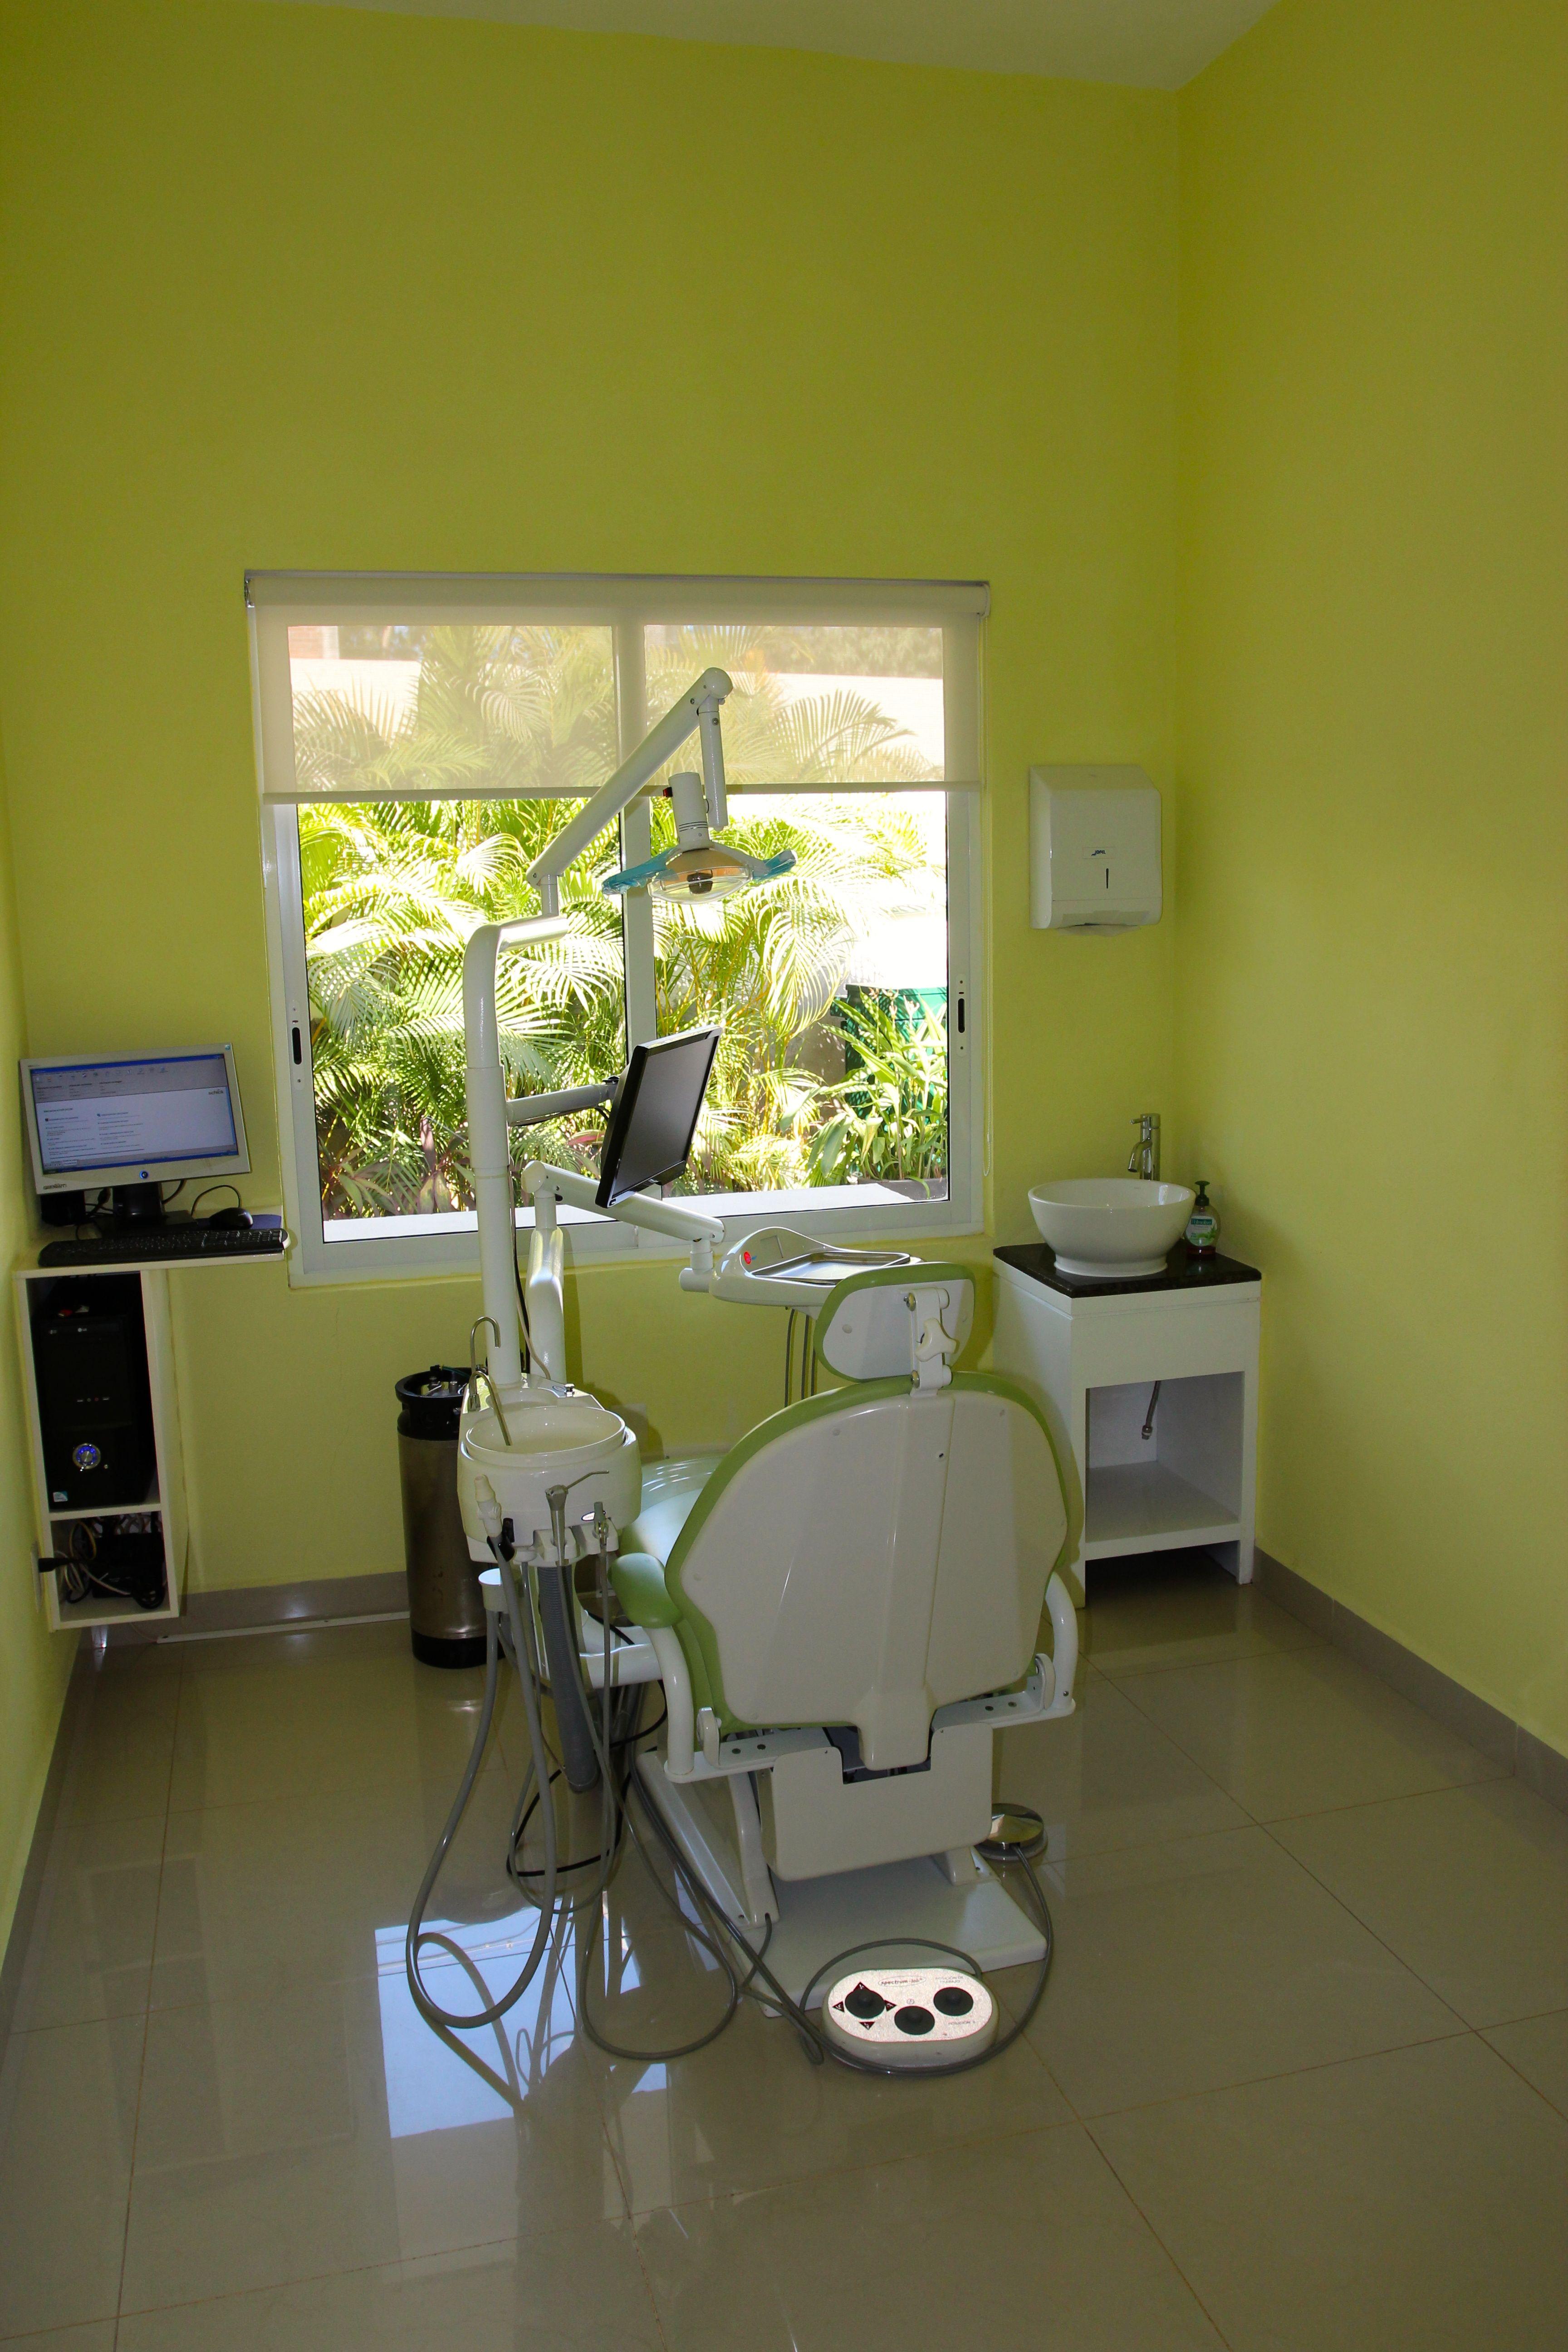 Dental Avant Garde Is A Full Service Dental Clinic Located In The  # Muebles Puerto Vallarta